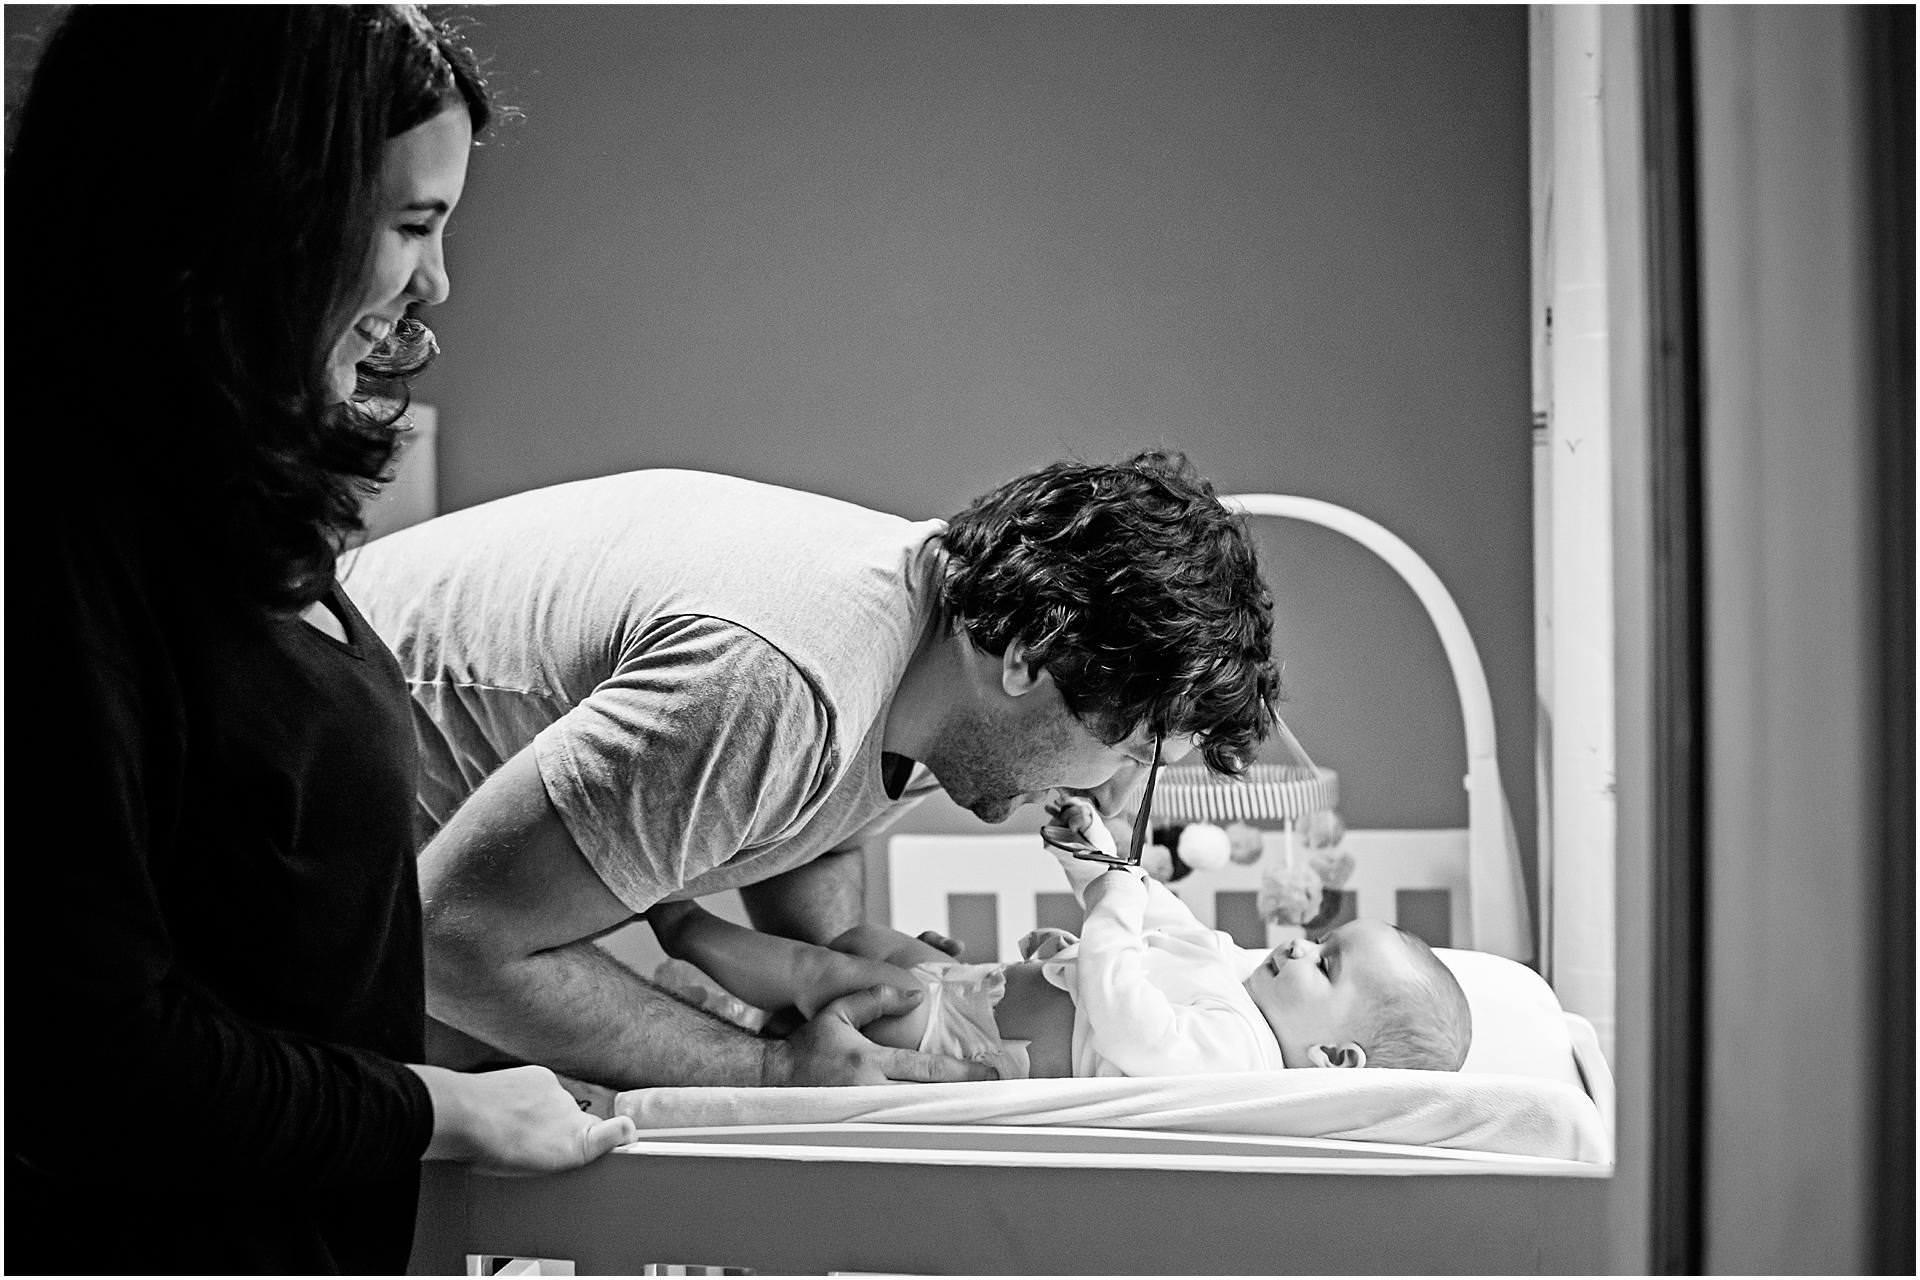 Newborn_photography with Sarah_bee_photography lifestyle_photography family_photography natural_photography photography_in_your_own_home baby_and_child_photography_1939.jpg